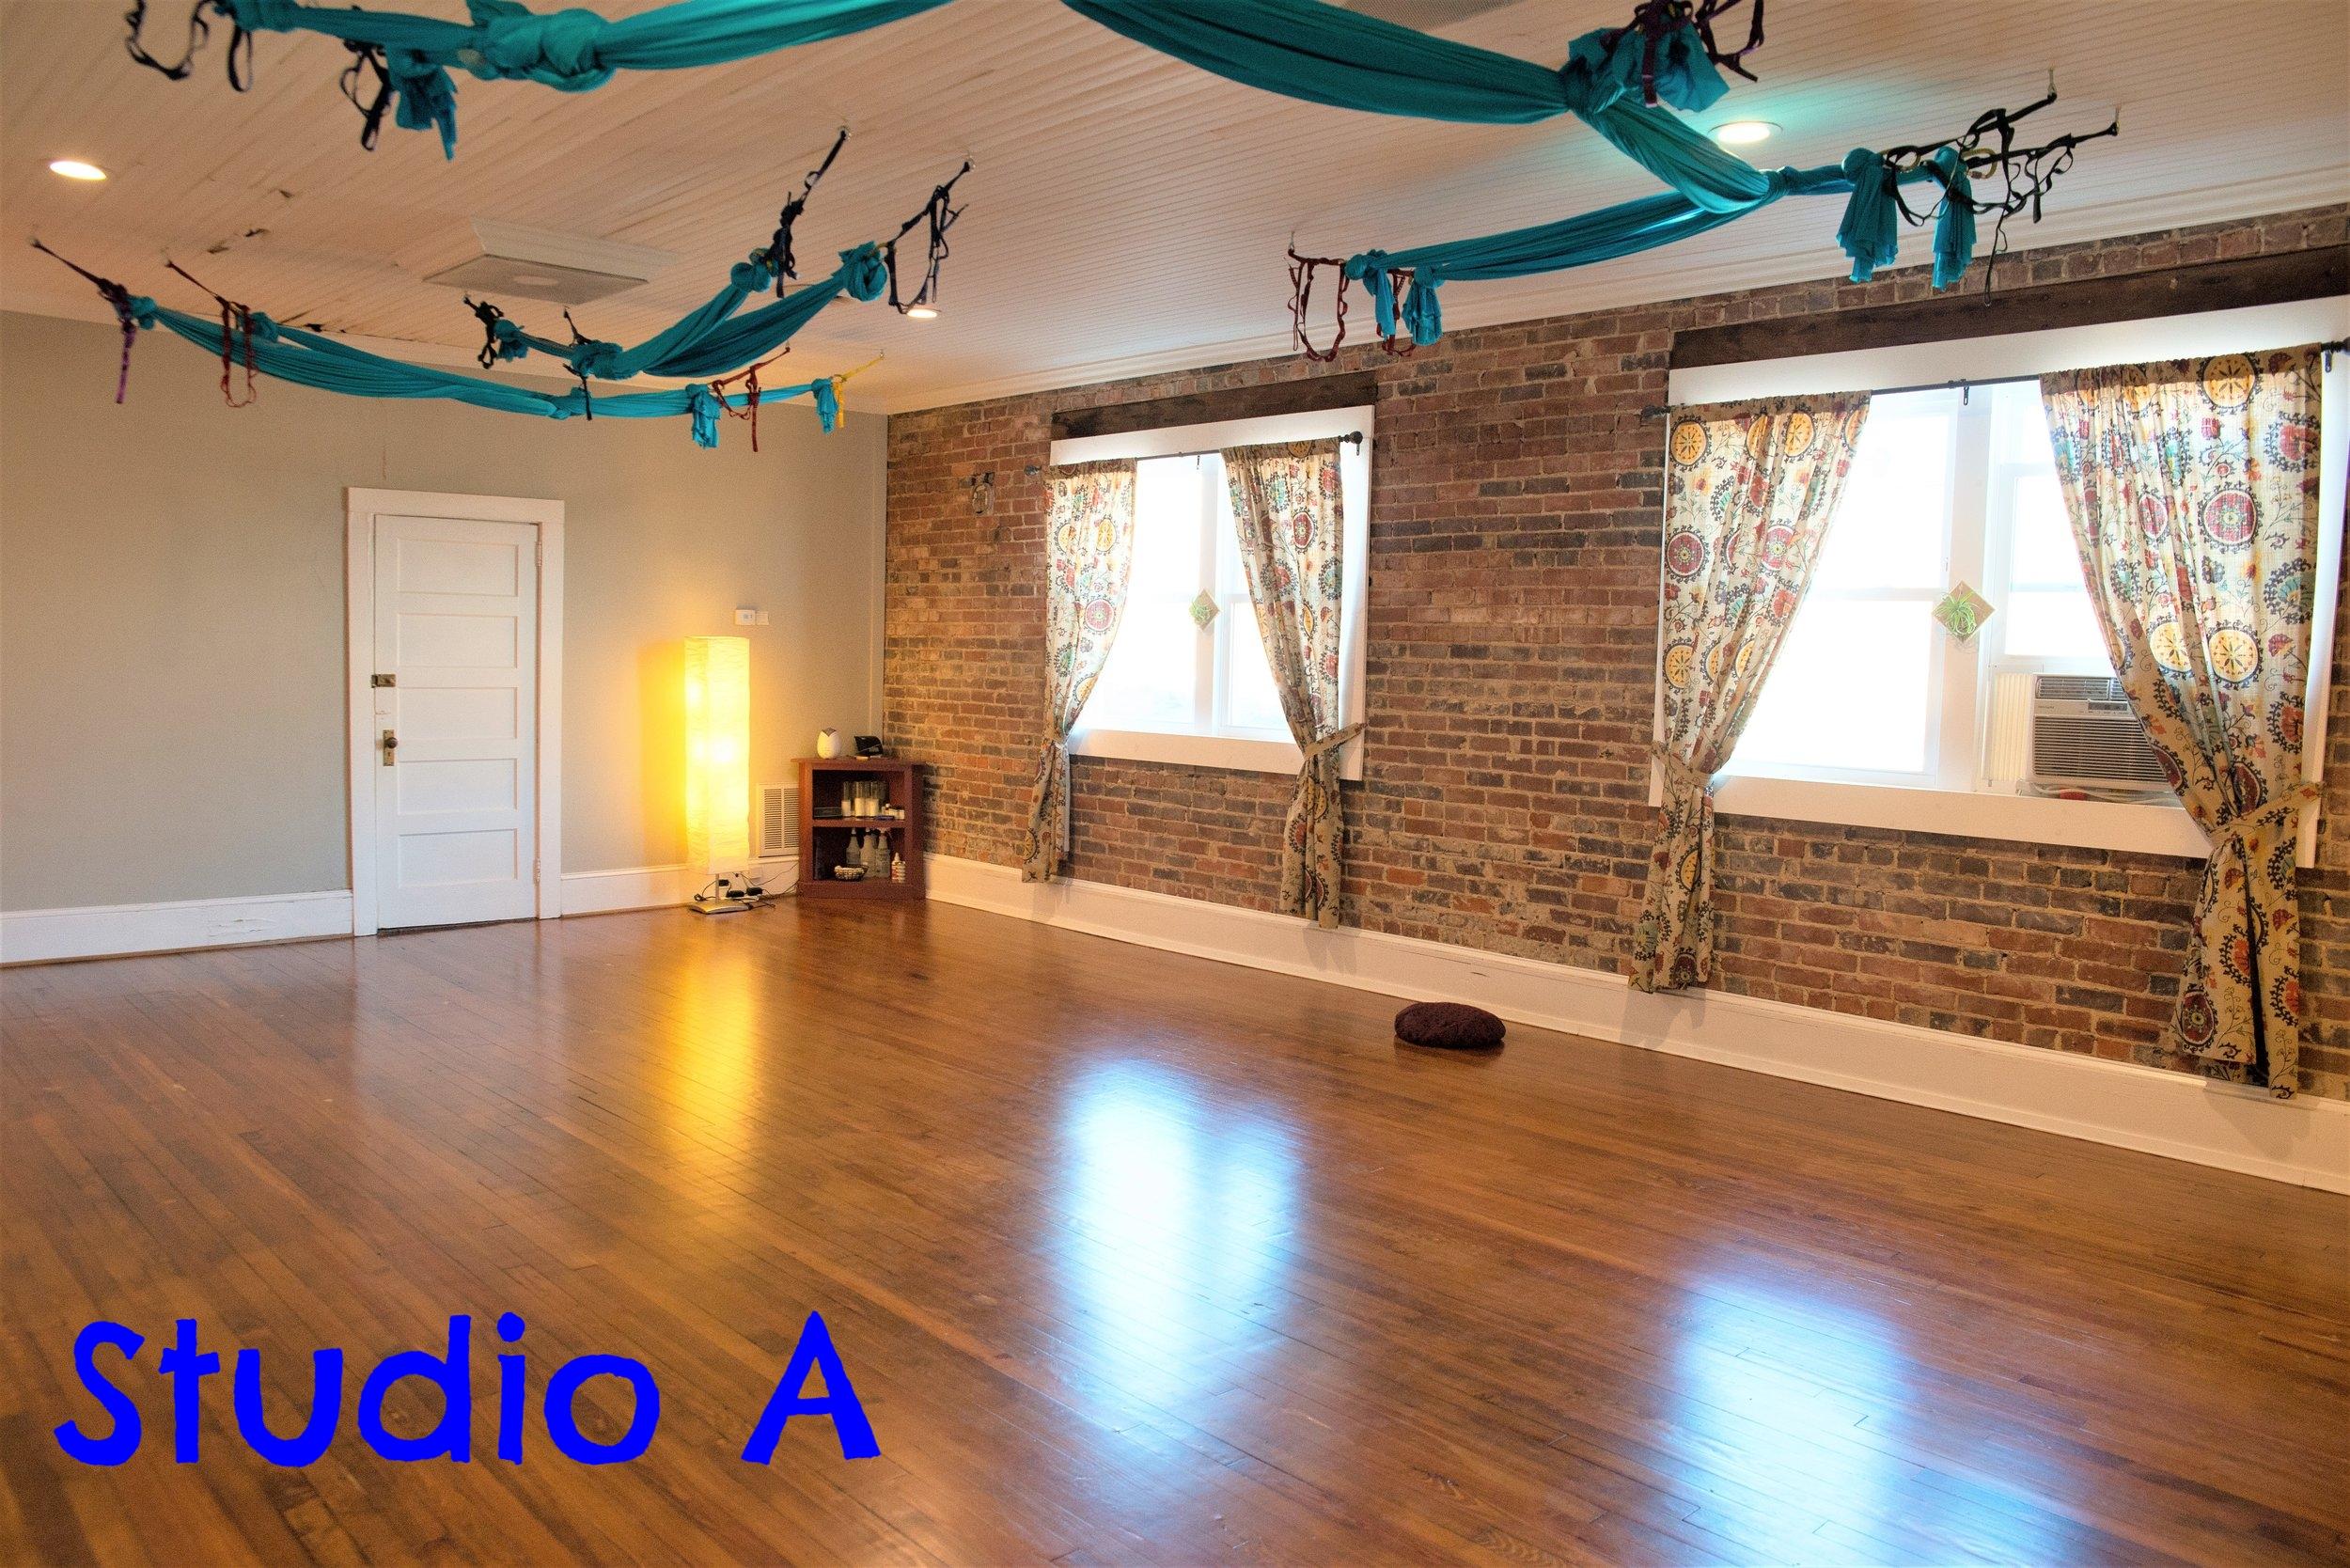 Studio A 2.jpg